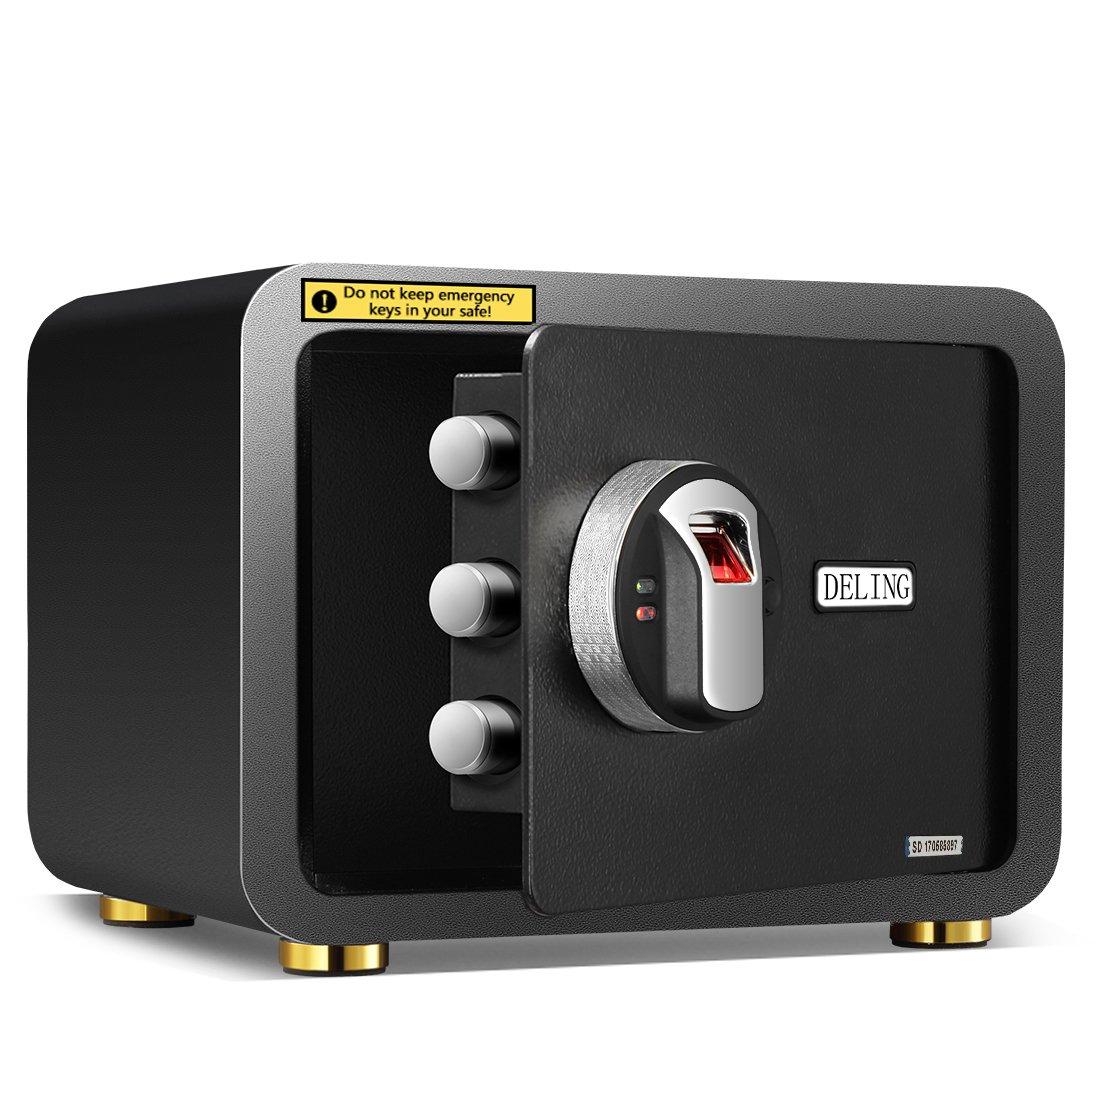 Ainfox Electronic Security Safe Box, 0.7 Cubic Feet Cabinets Fingerprint Biometric Wall Safe Lock Box Cash Strongbox with Emergency Lock